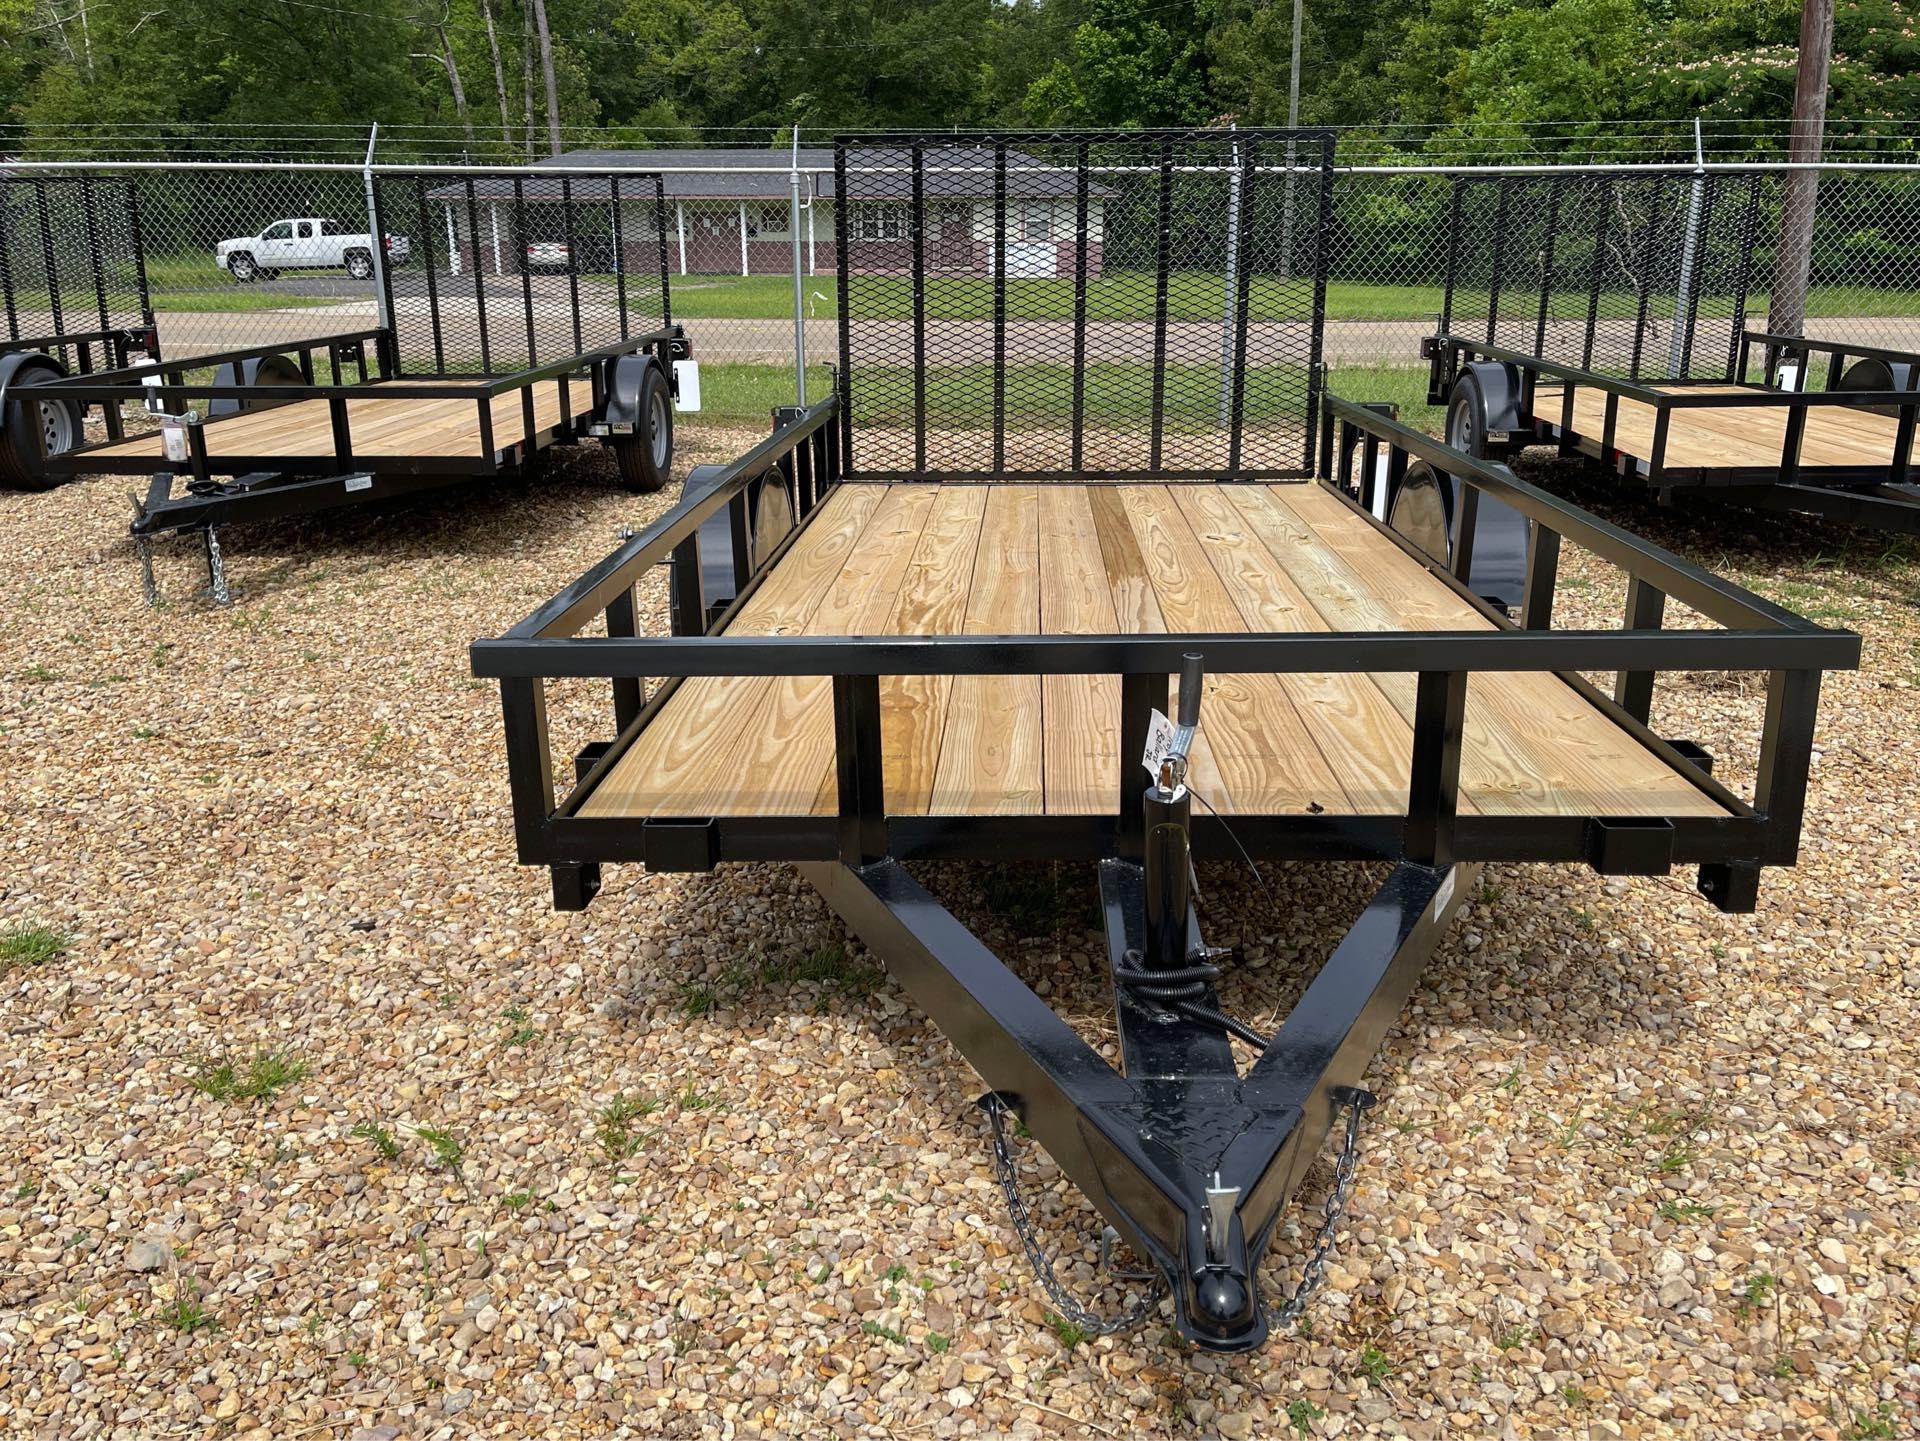 2022 MCCLAIN TRAILERS 6X13 at ATV Zone, LLC